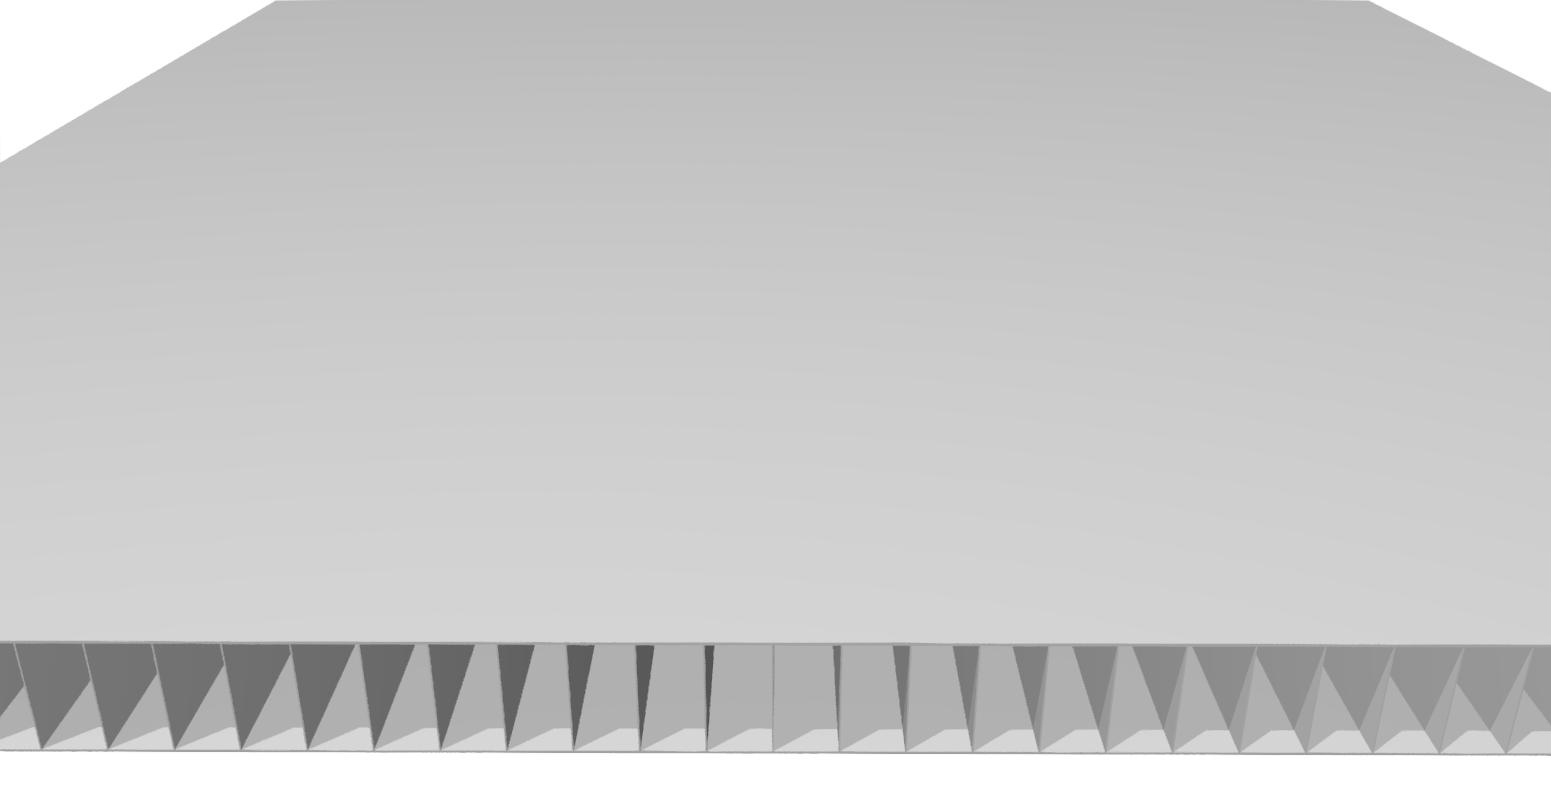 HohlkammerplatteCon Pearl 9,9 mm Ral 7046, grau